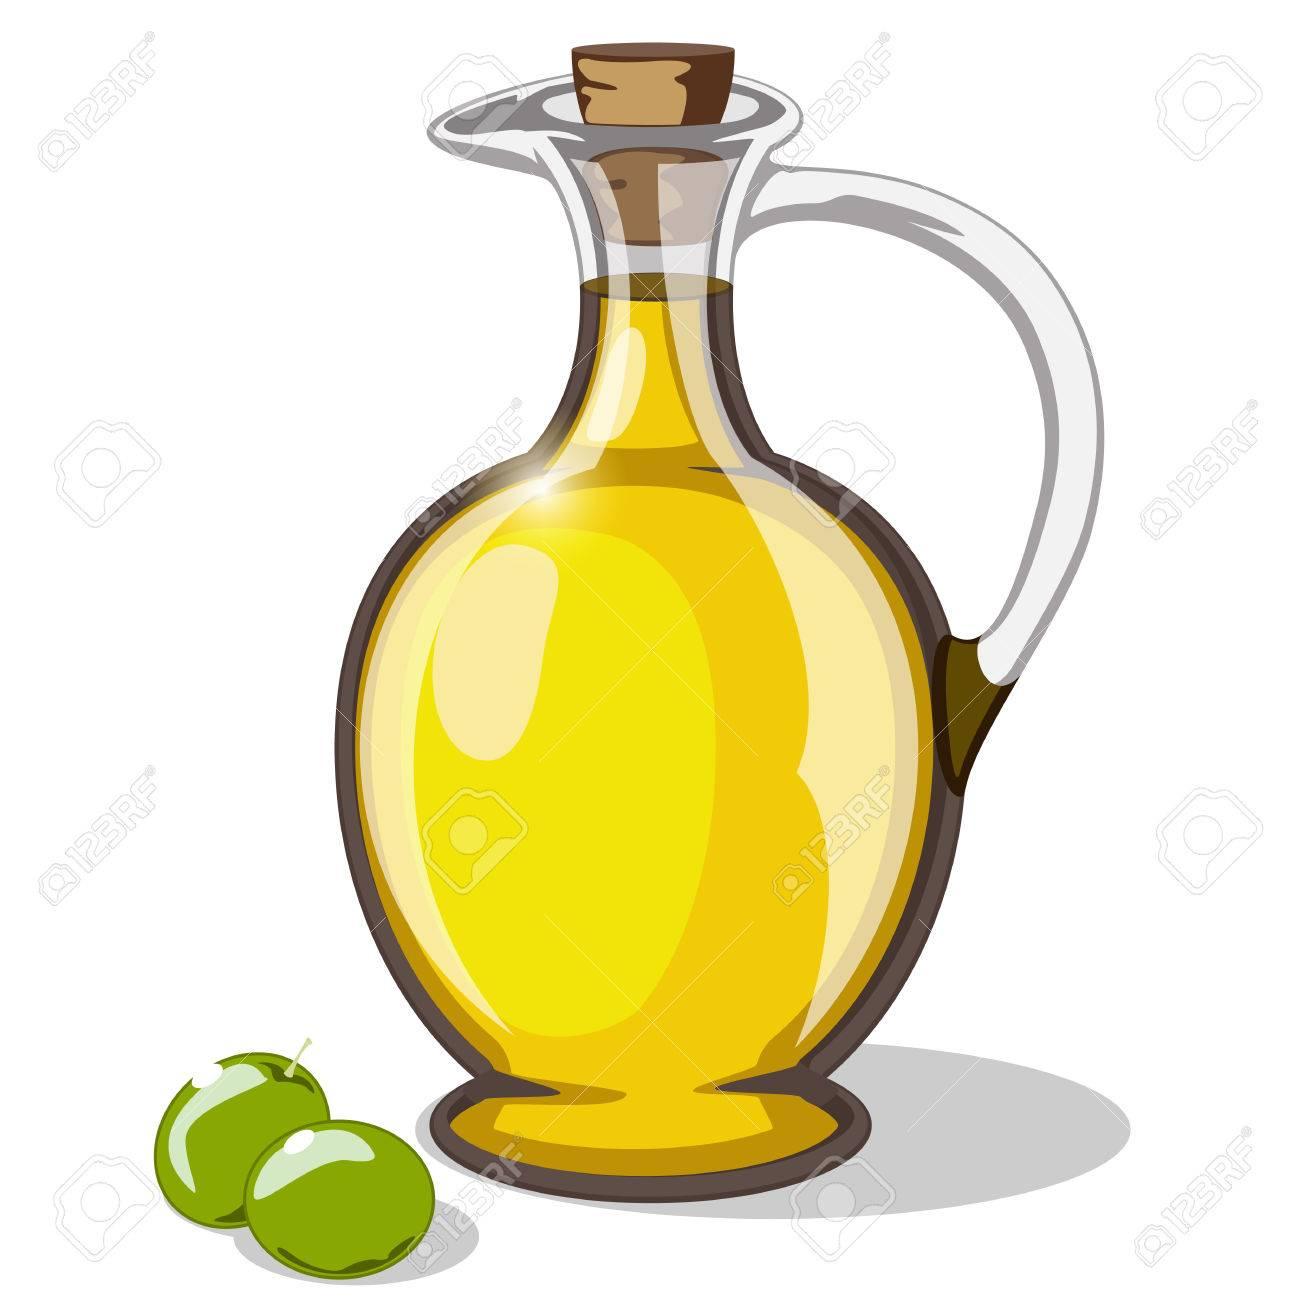 olive oil Stock Vector - 29836158